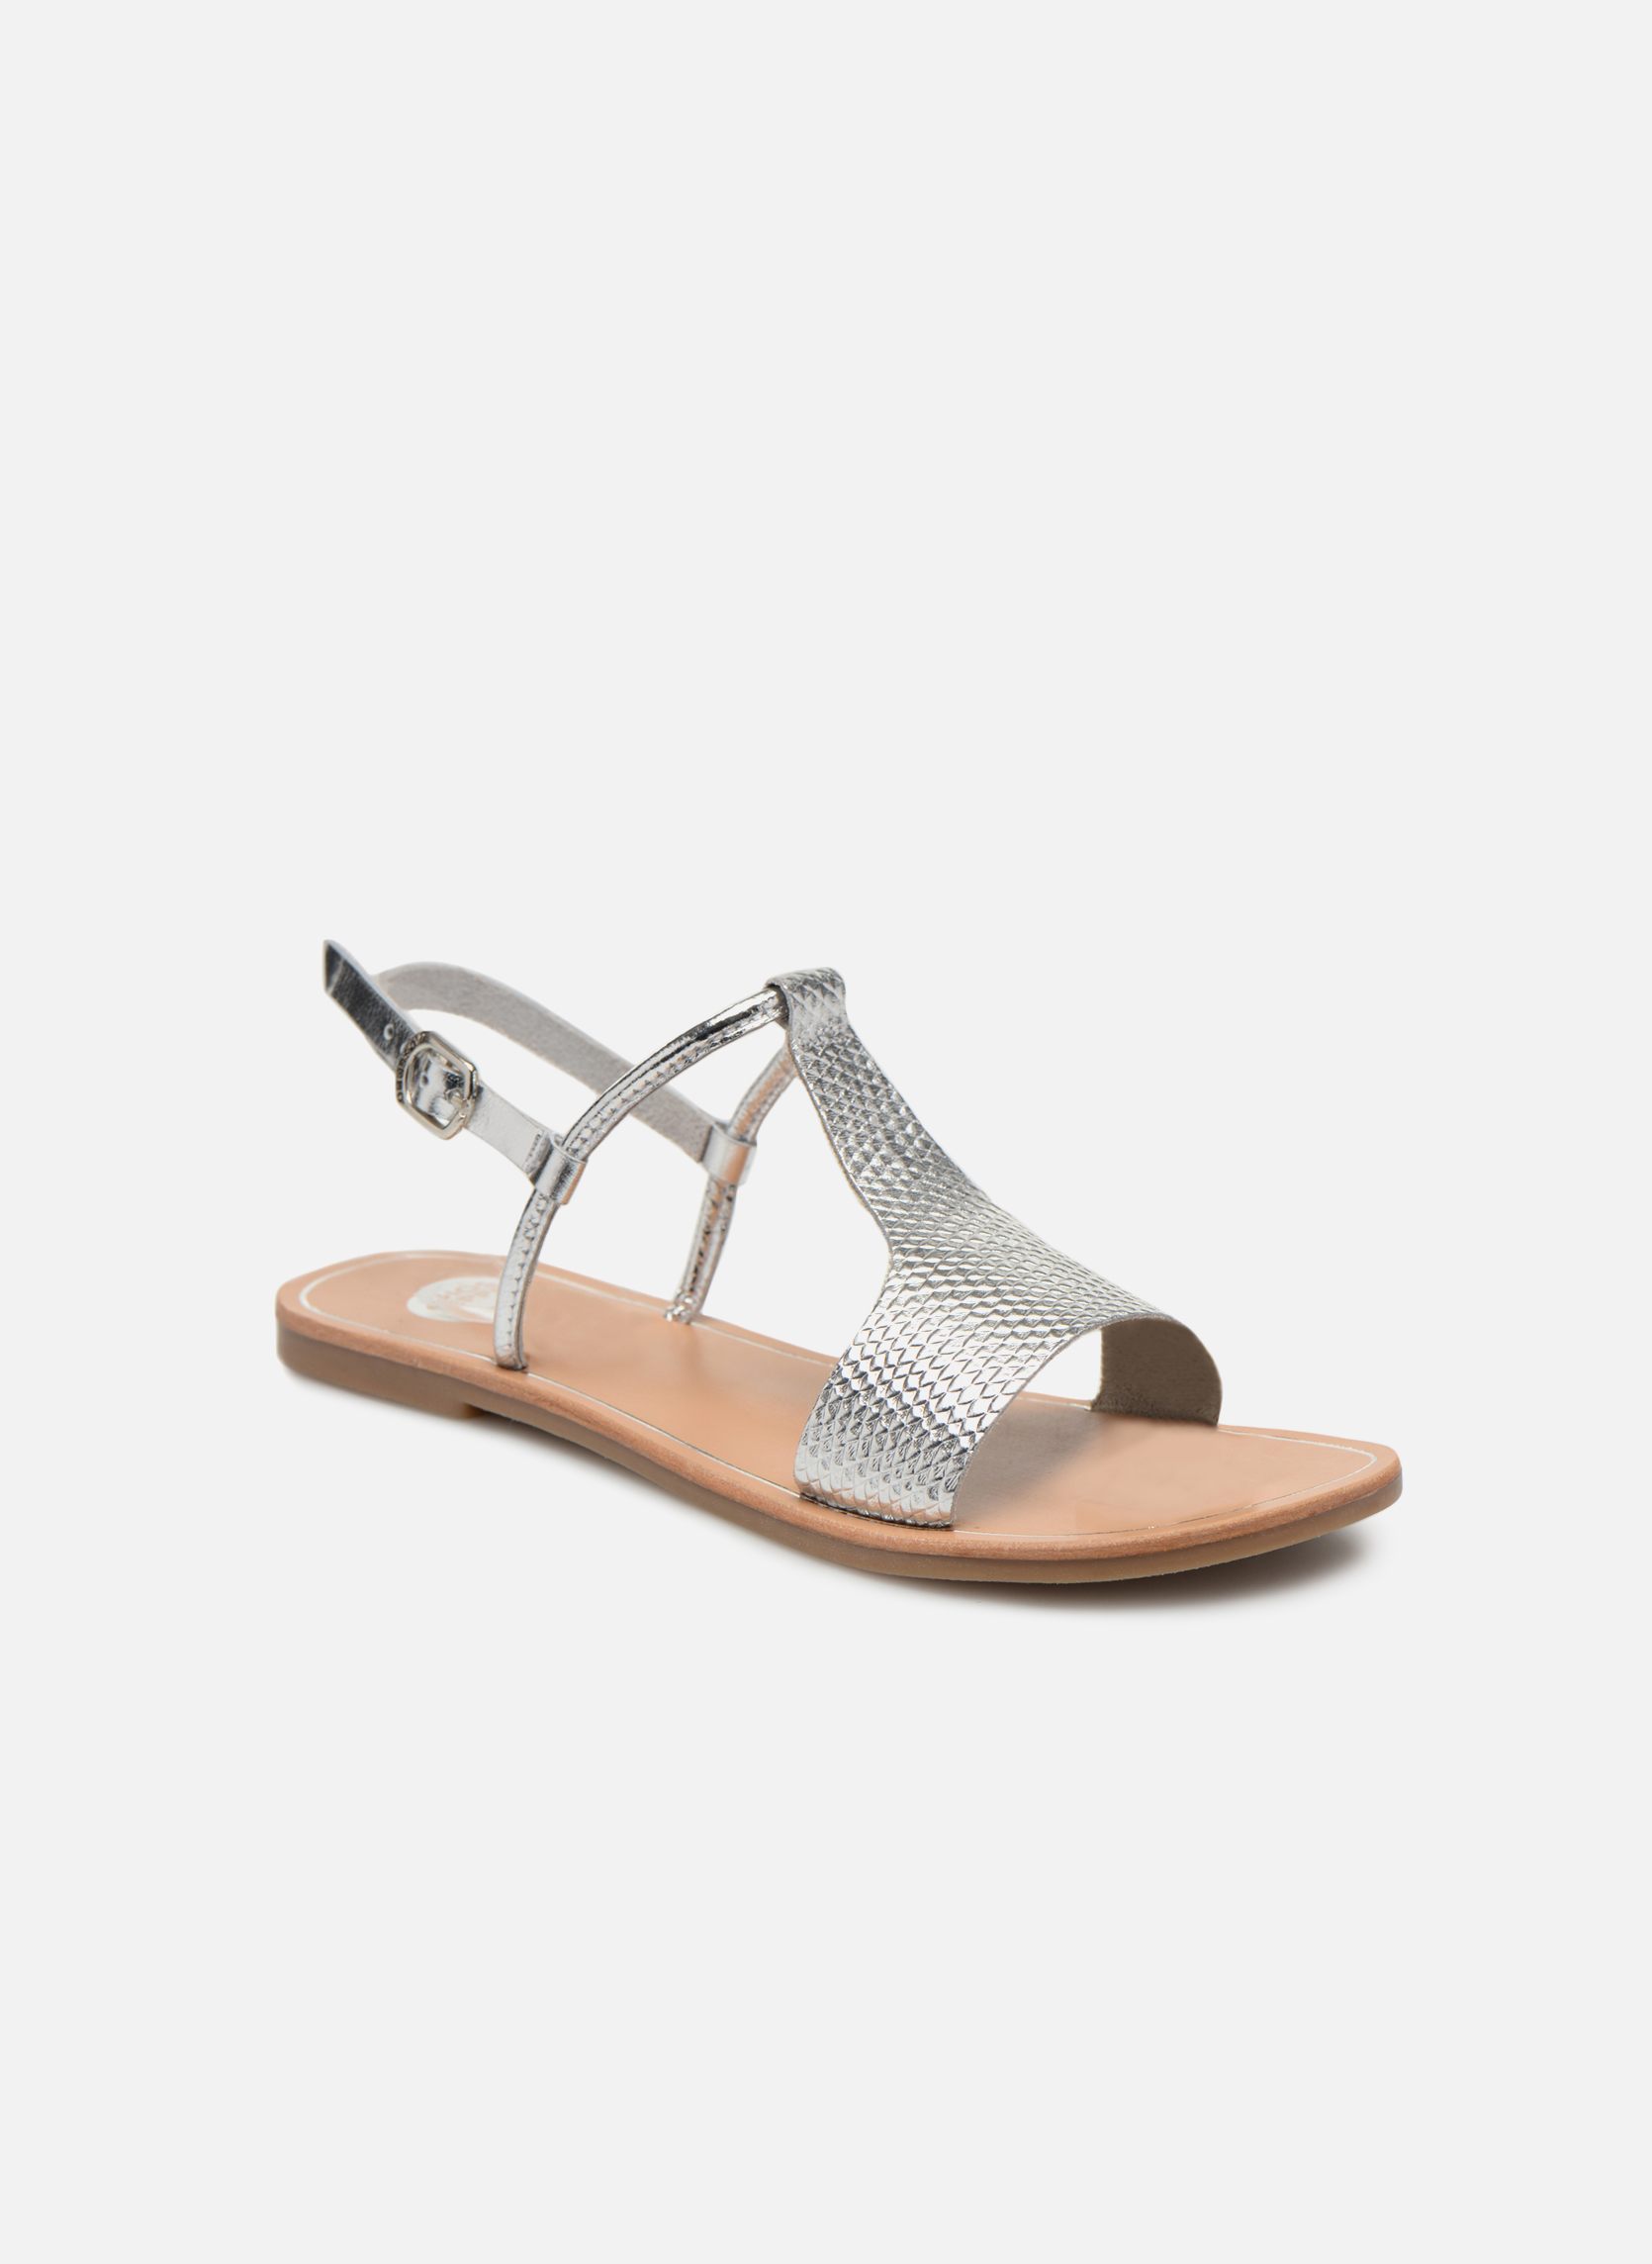 Sandaler Børn Bavana